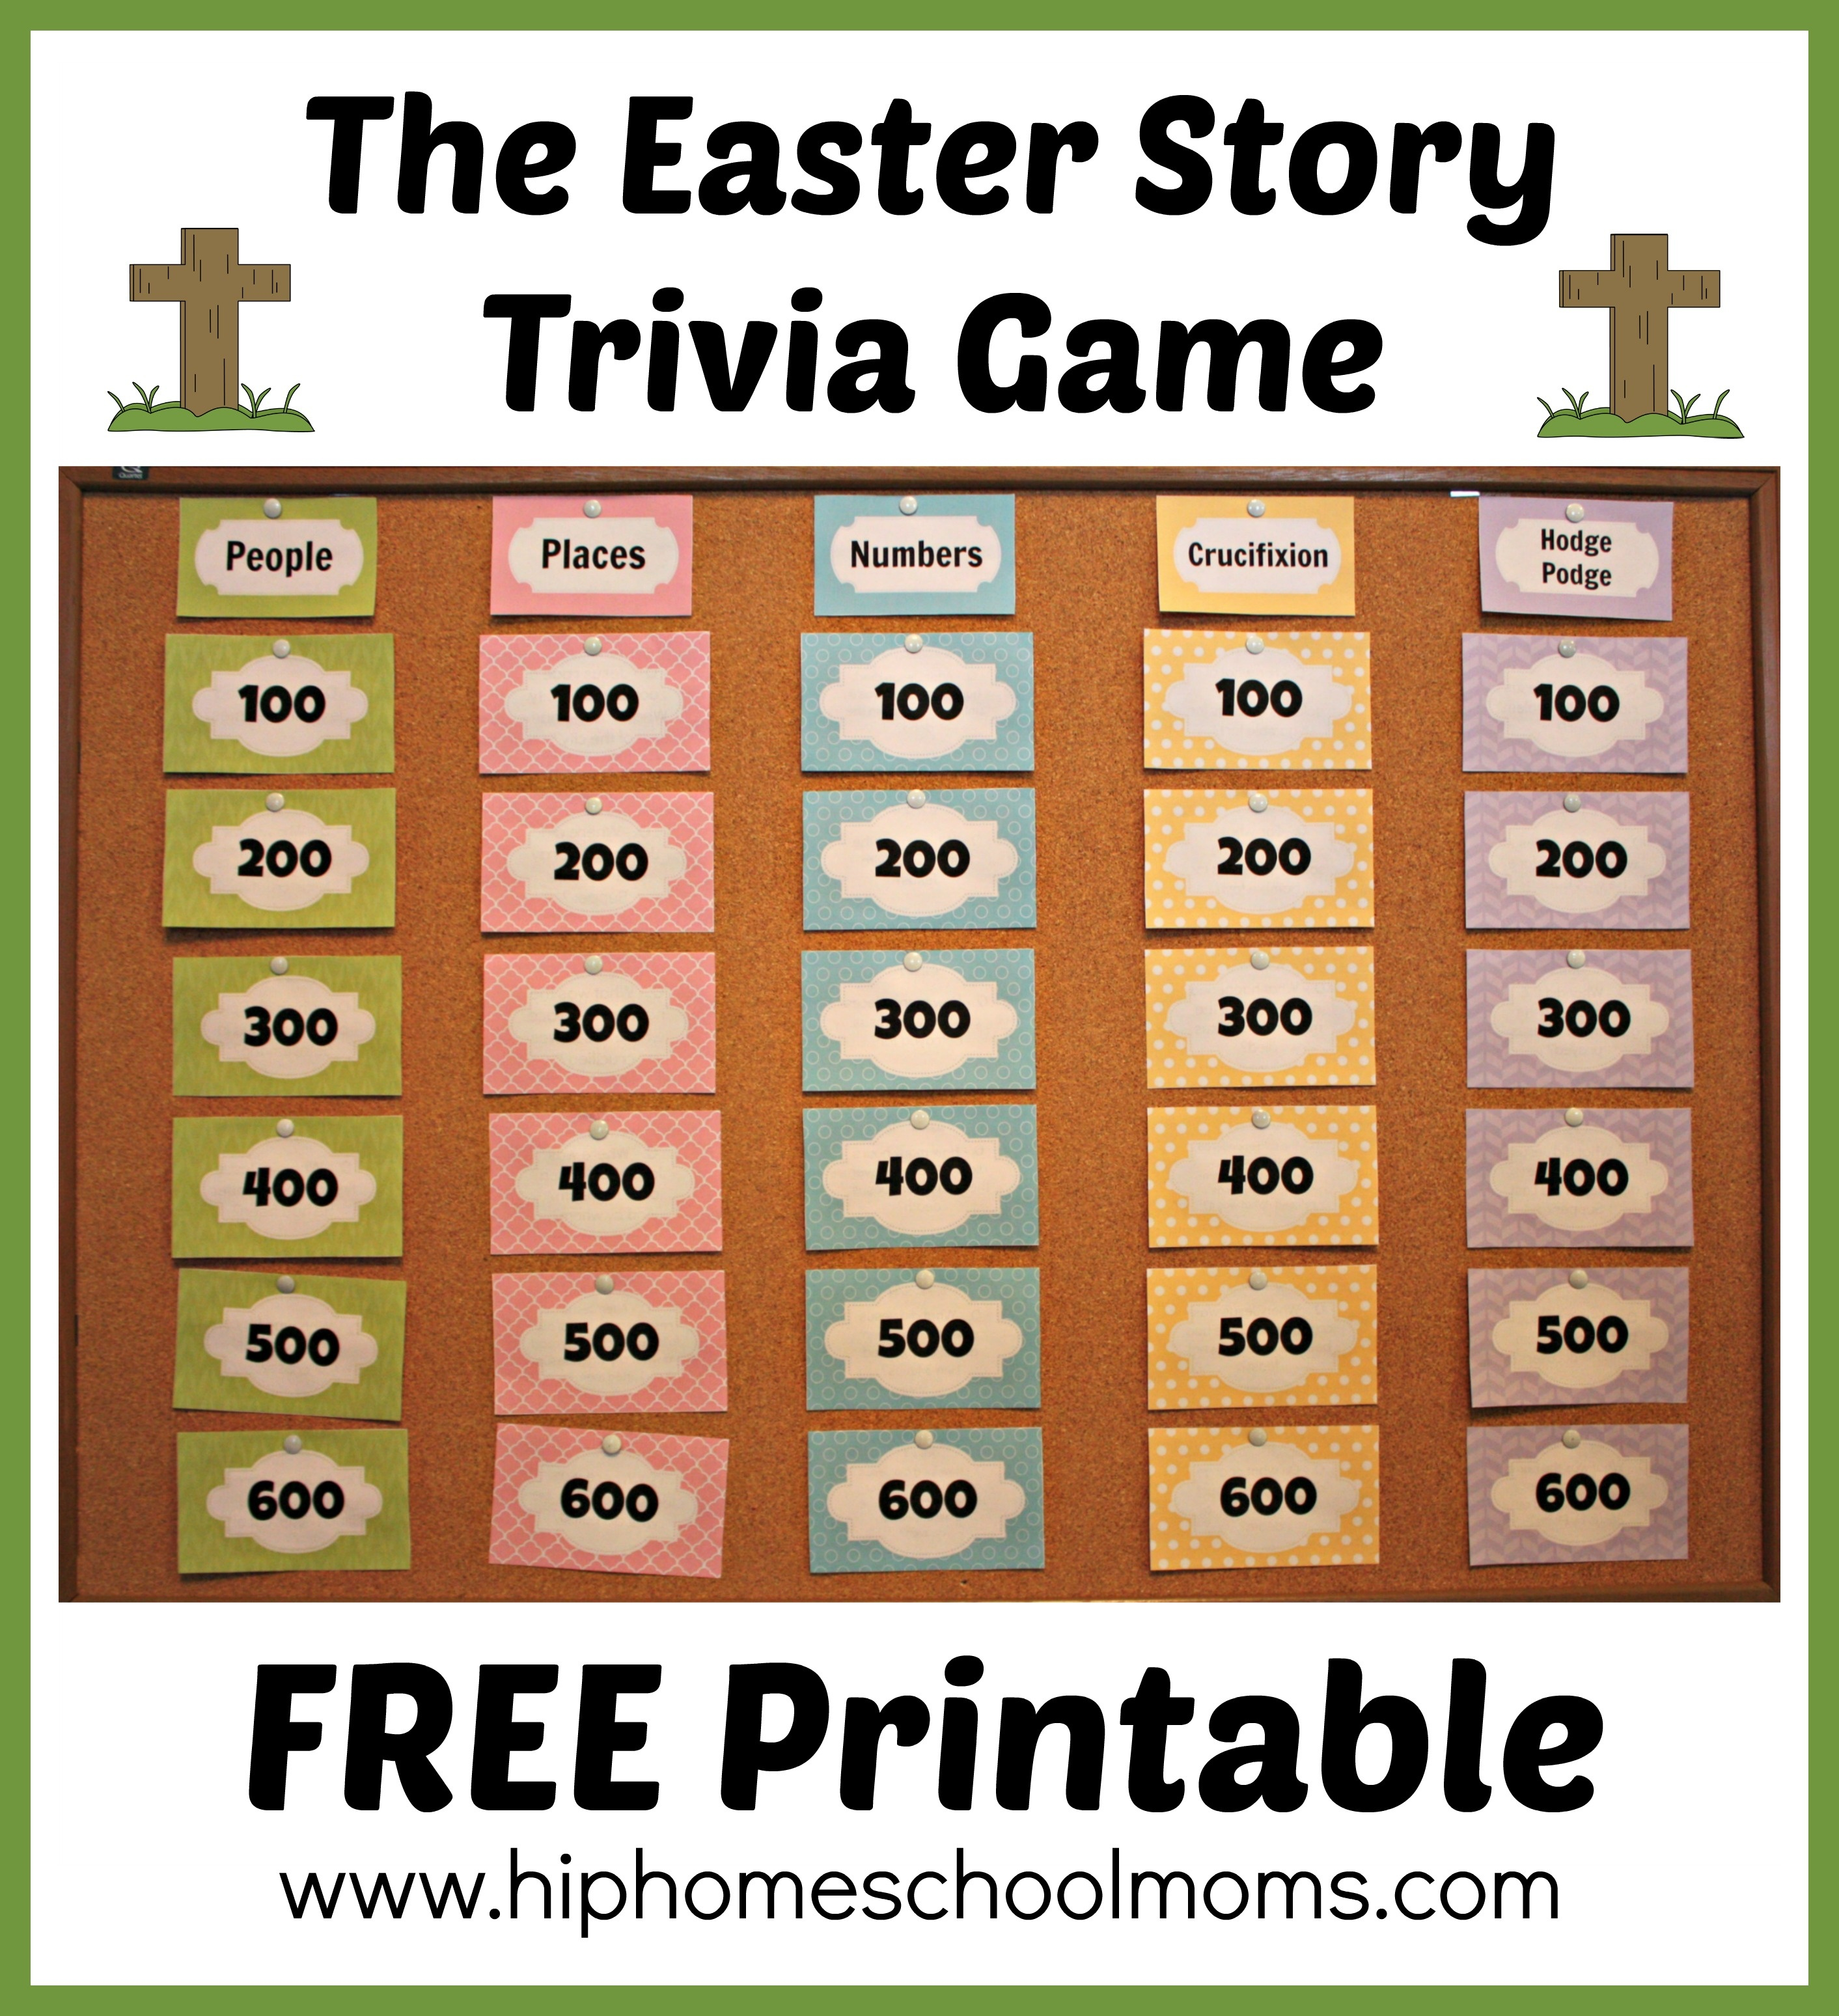 Printable Easter Story Trivia Game | Hip Homeschool Moms - Free Printable Bible Trivia For Adults